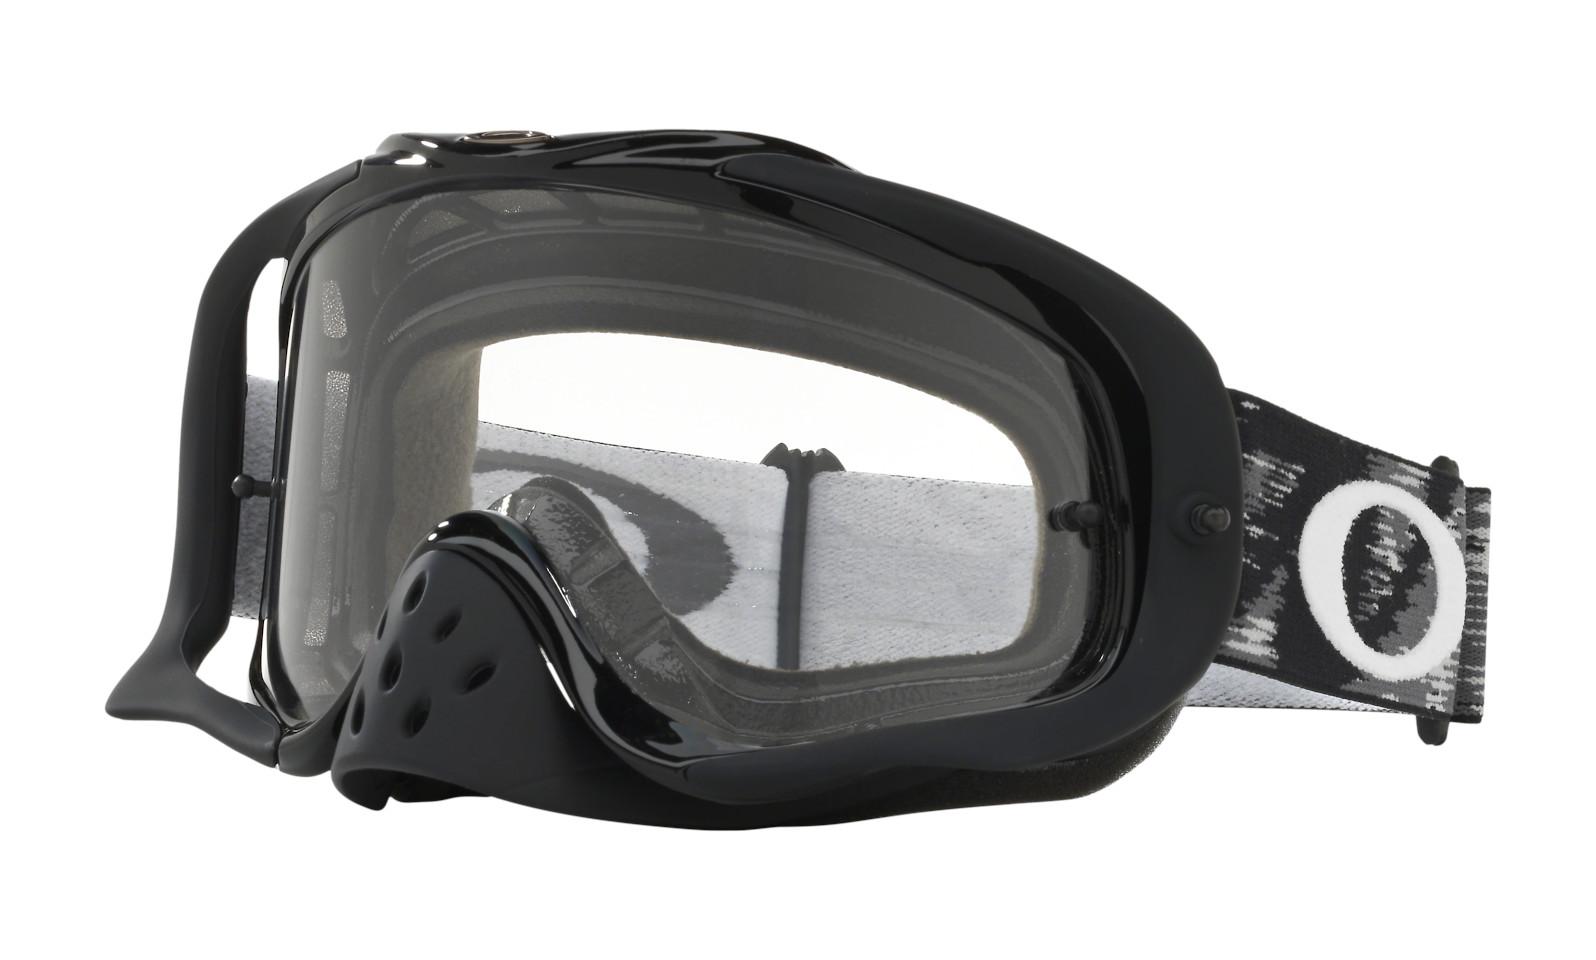 Oakley Crowbar MX Goggles - Jet Black Speed frame, Clear lens